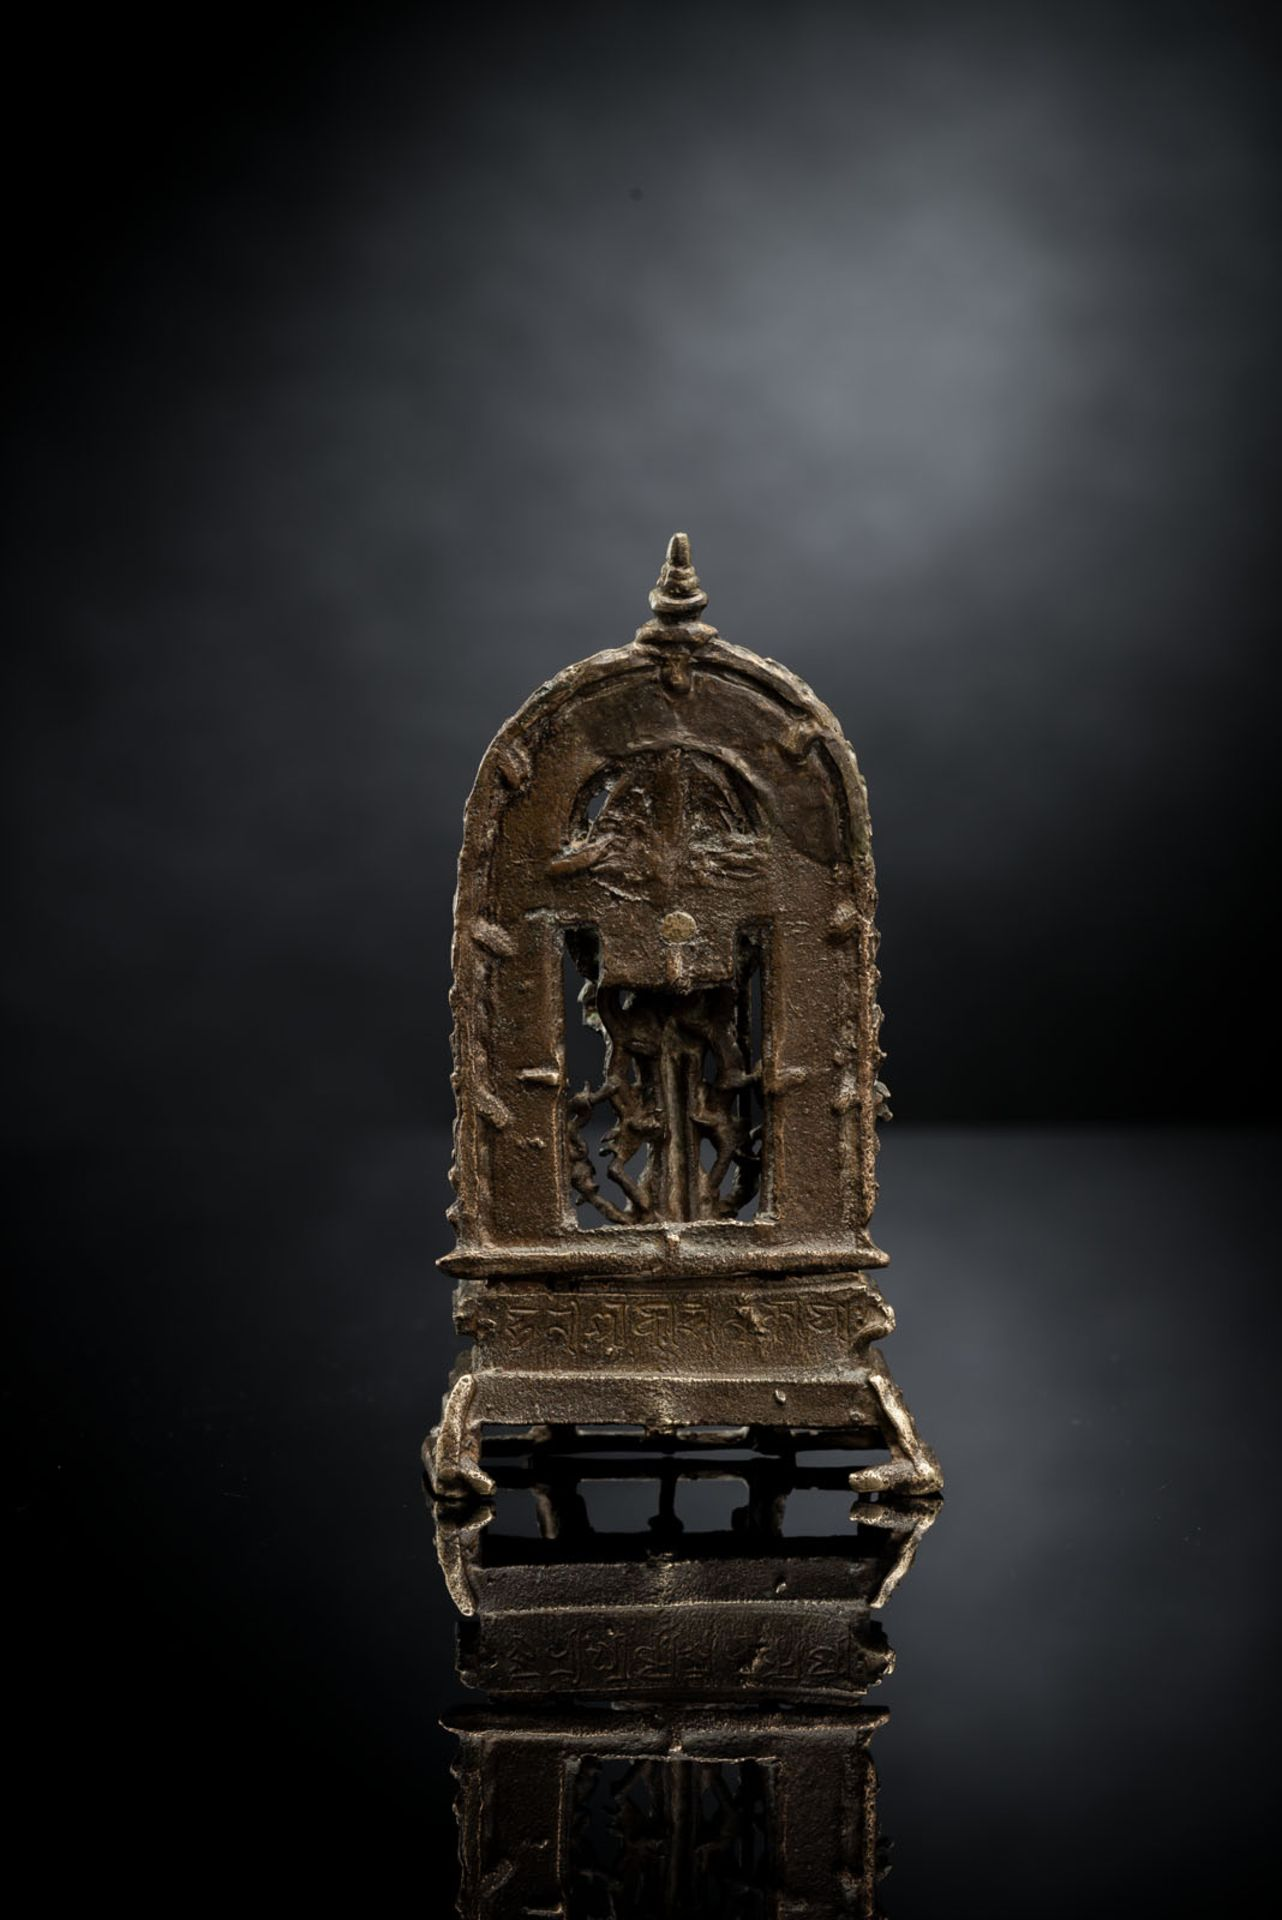 A BRONZE FIGURE OF VISHNU - Image 2 of 4